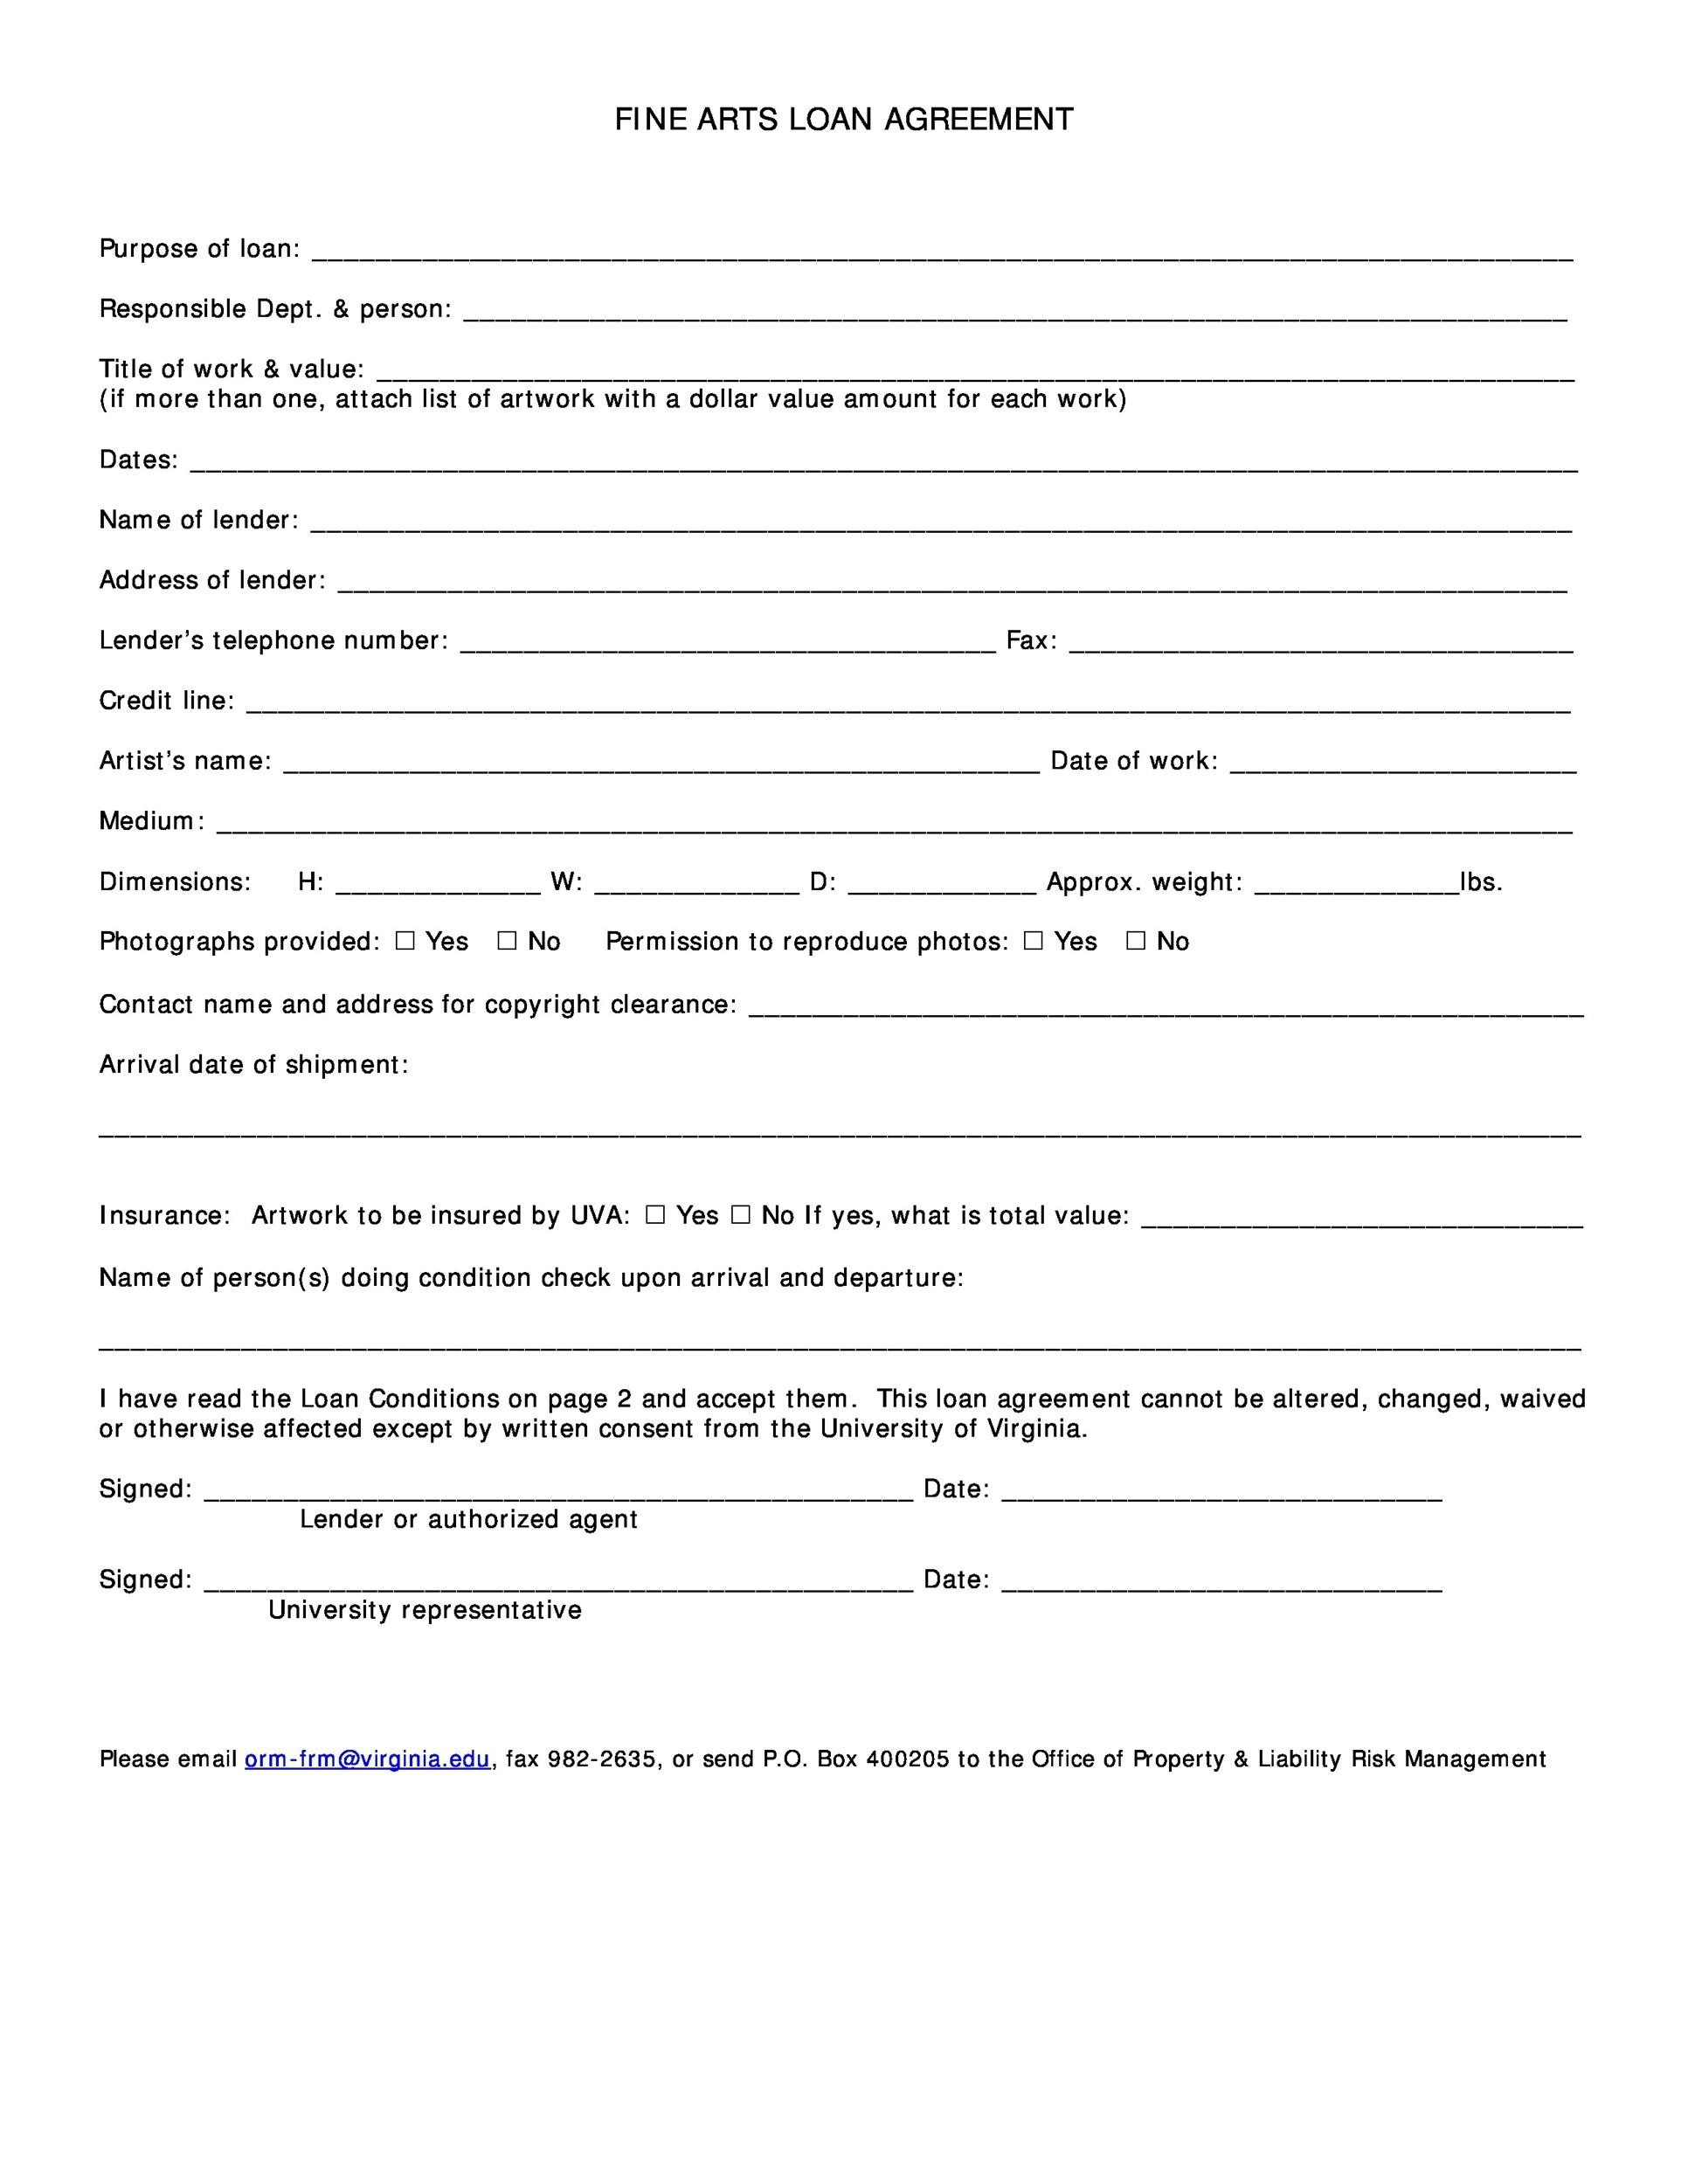 Loan Document Template: 40+ Free Loan Agreement Templates [Word & PDF]